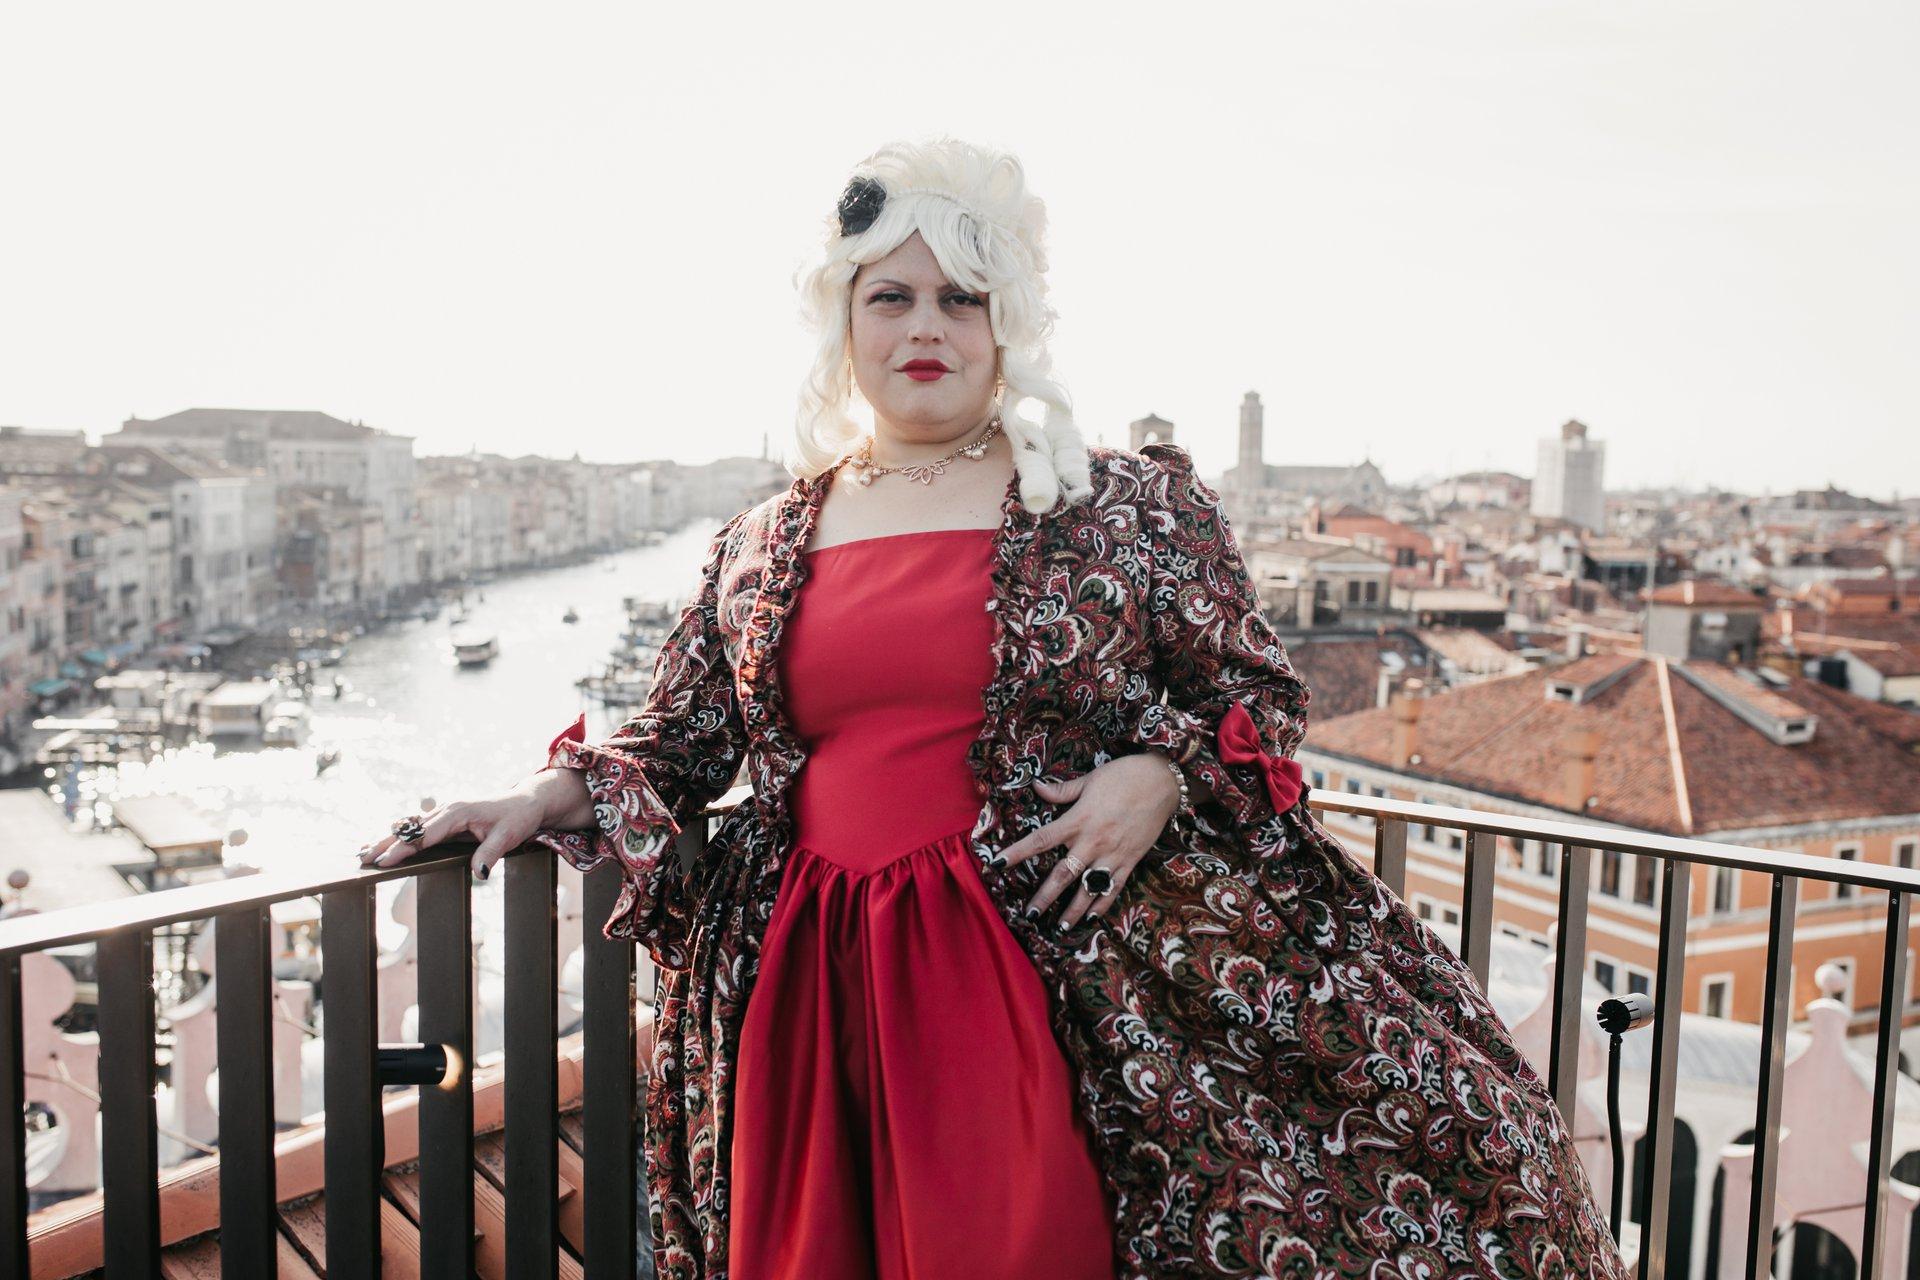 Flytographer Travel Story - Venice  Carnevale Birthday trip